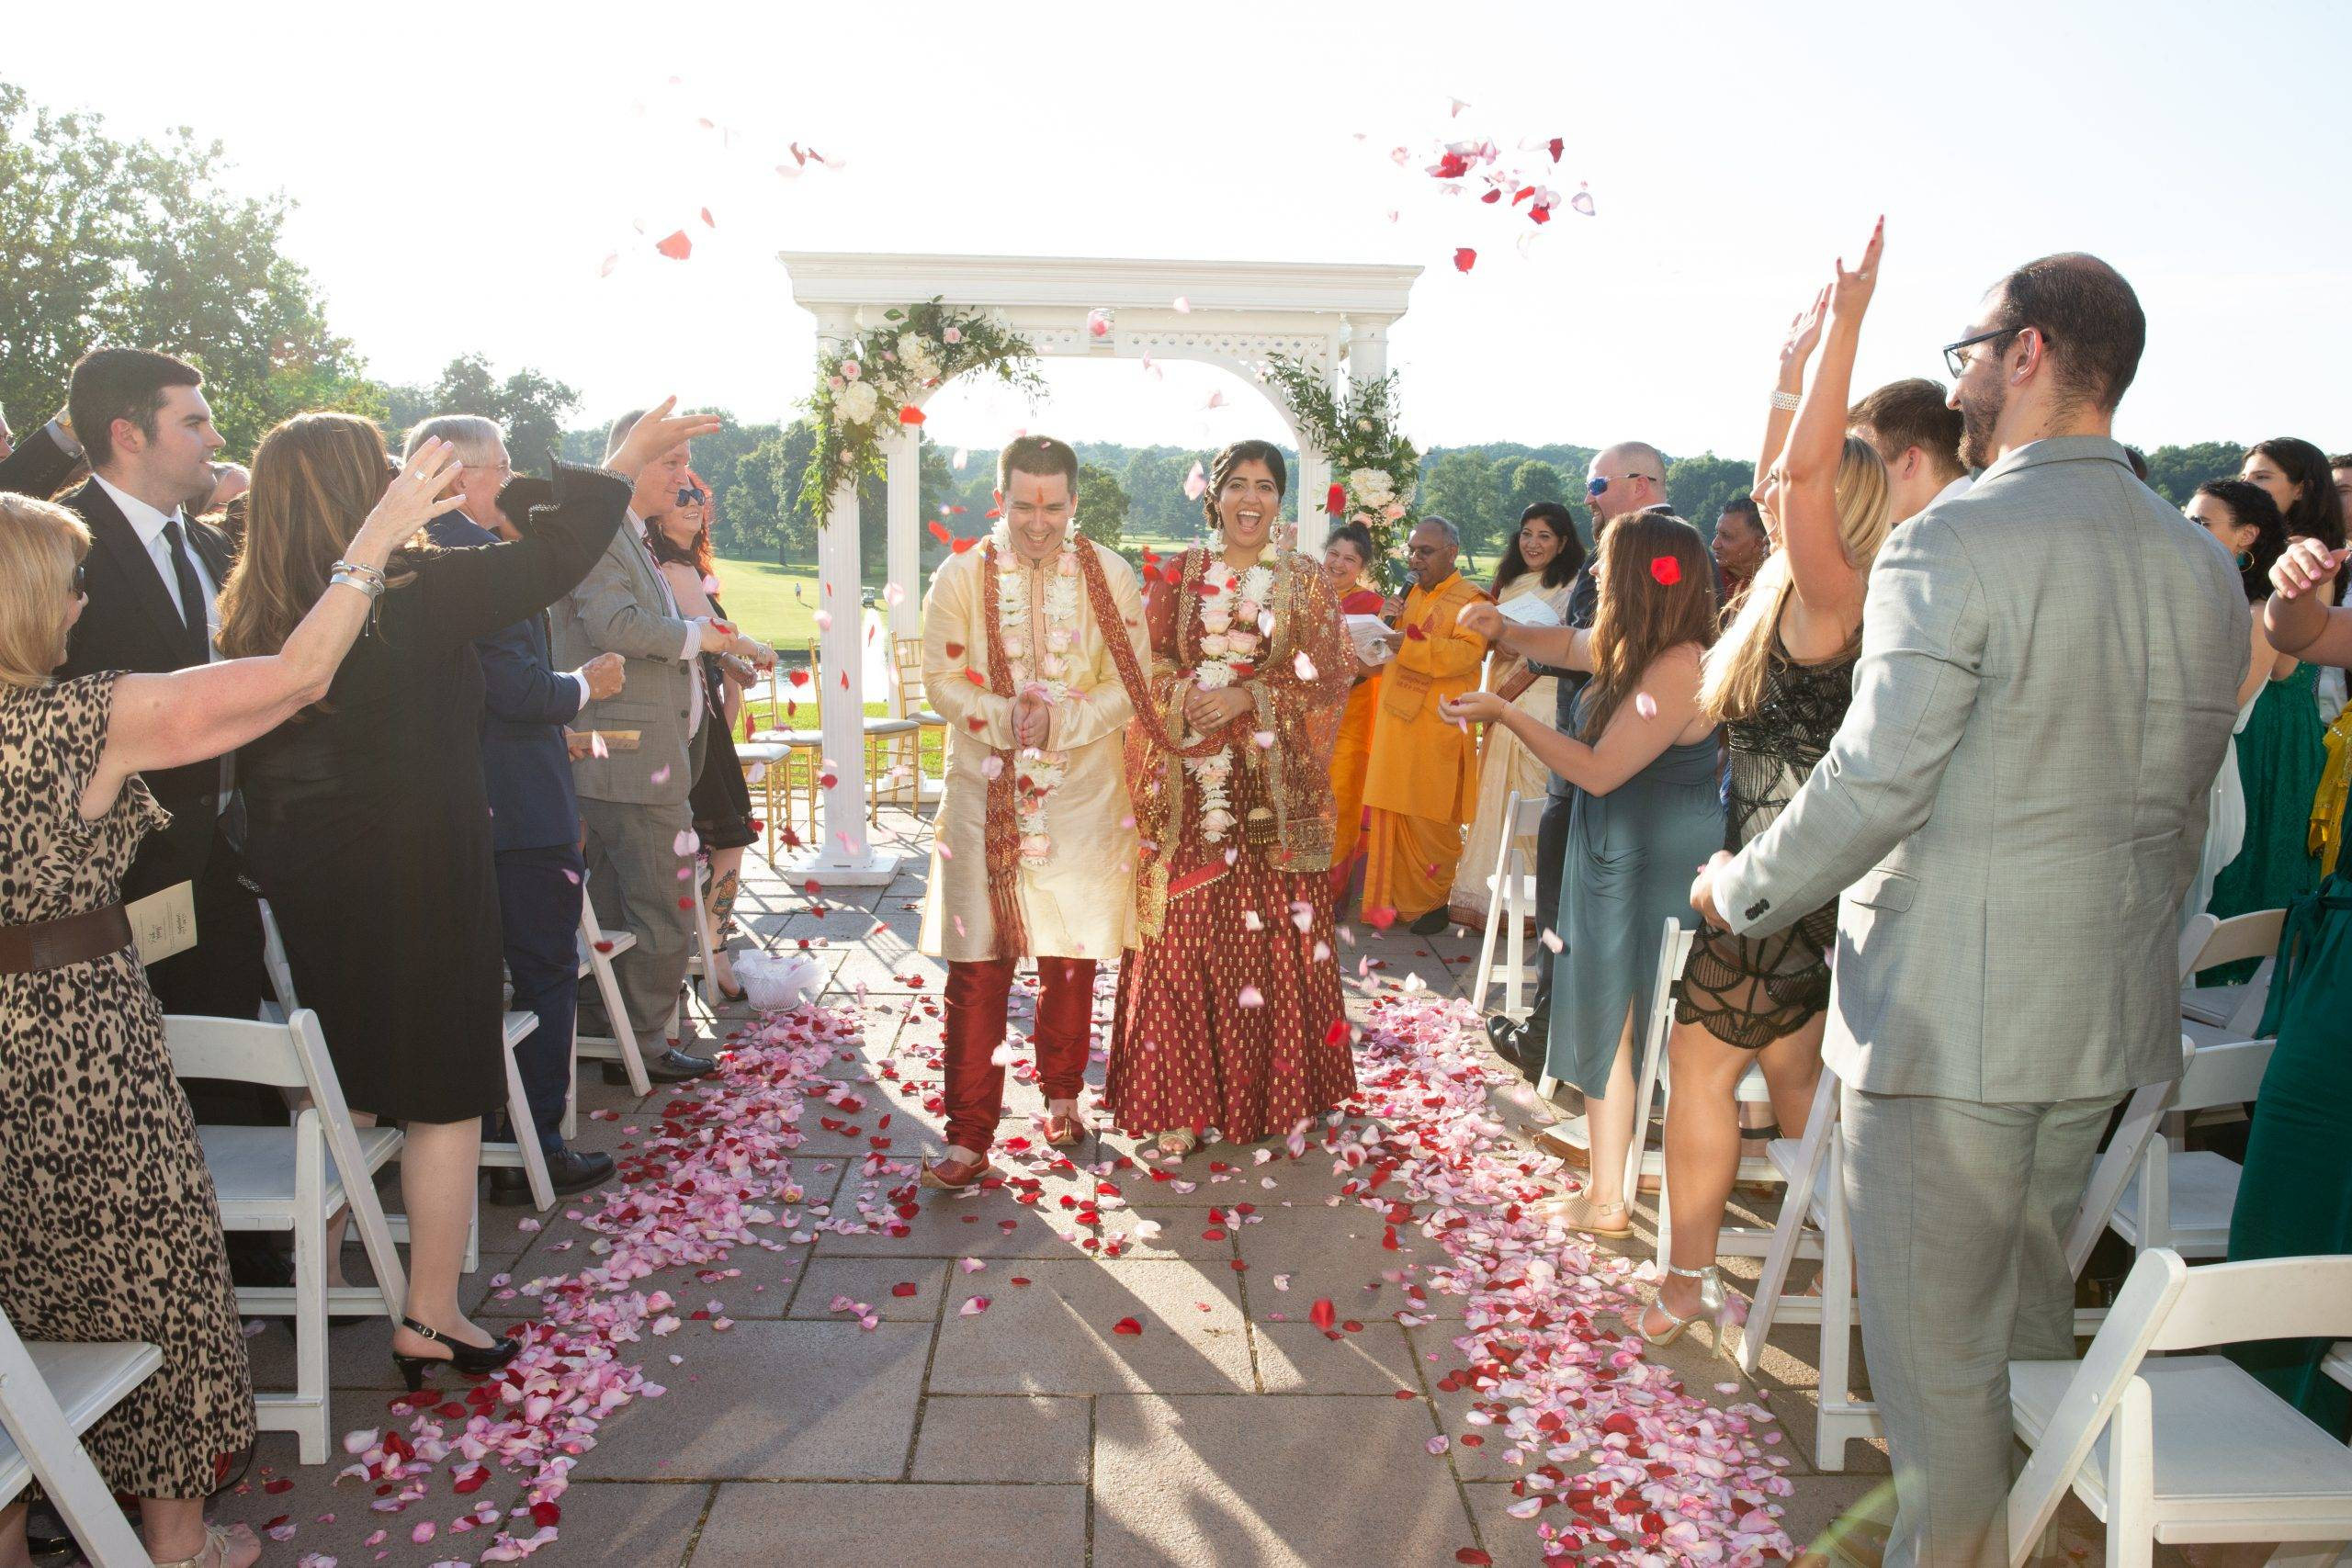 Brooklake Indian wedding couple walking down the aisle